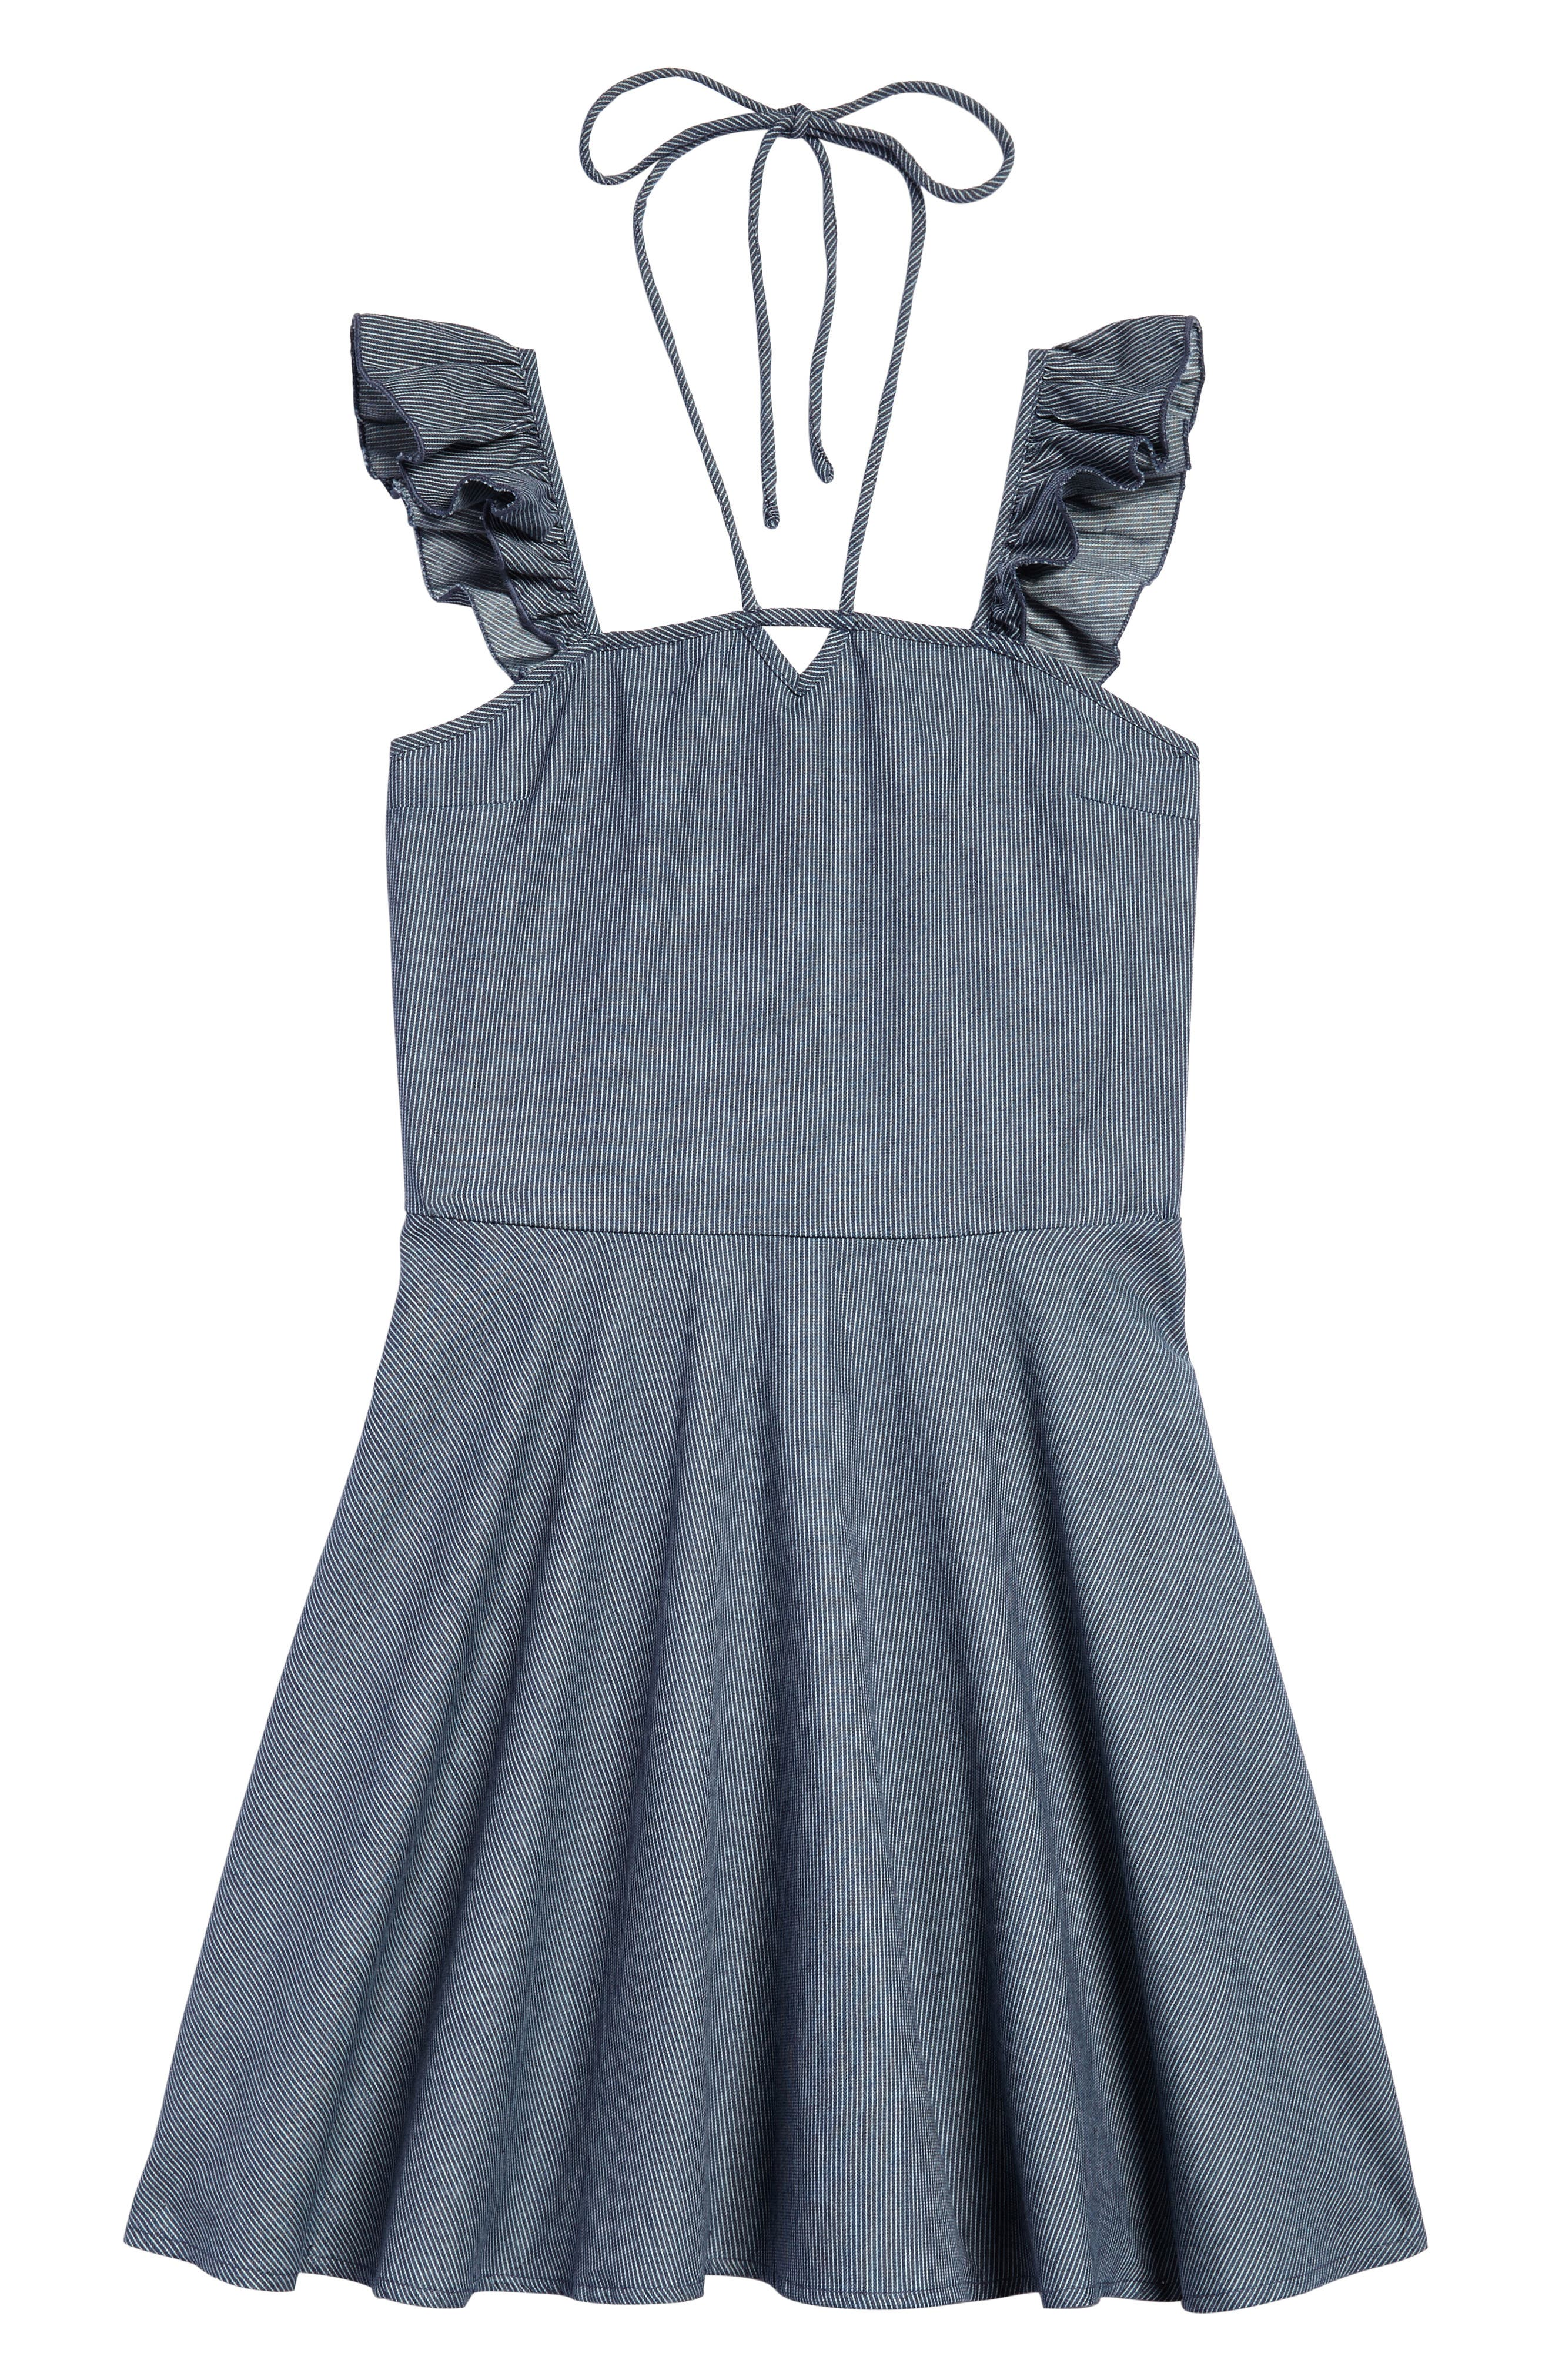 Ruffle Shoulder Dress,                         Main,                         color, 410